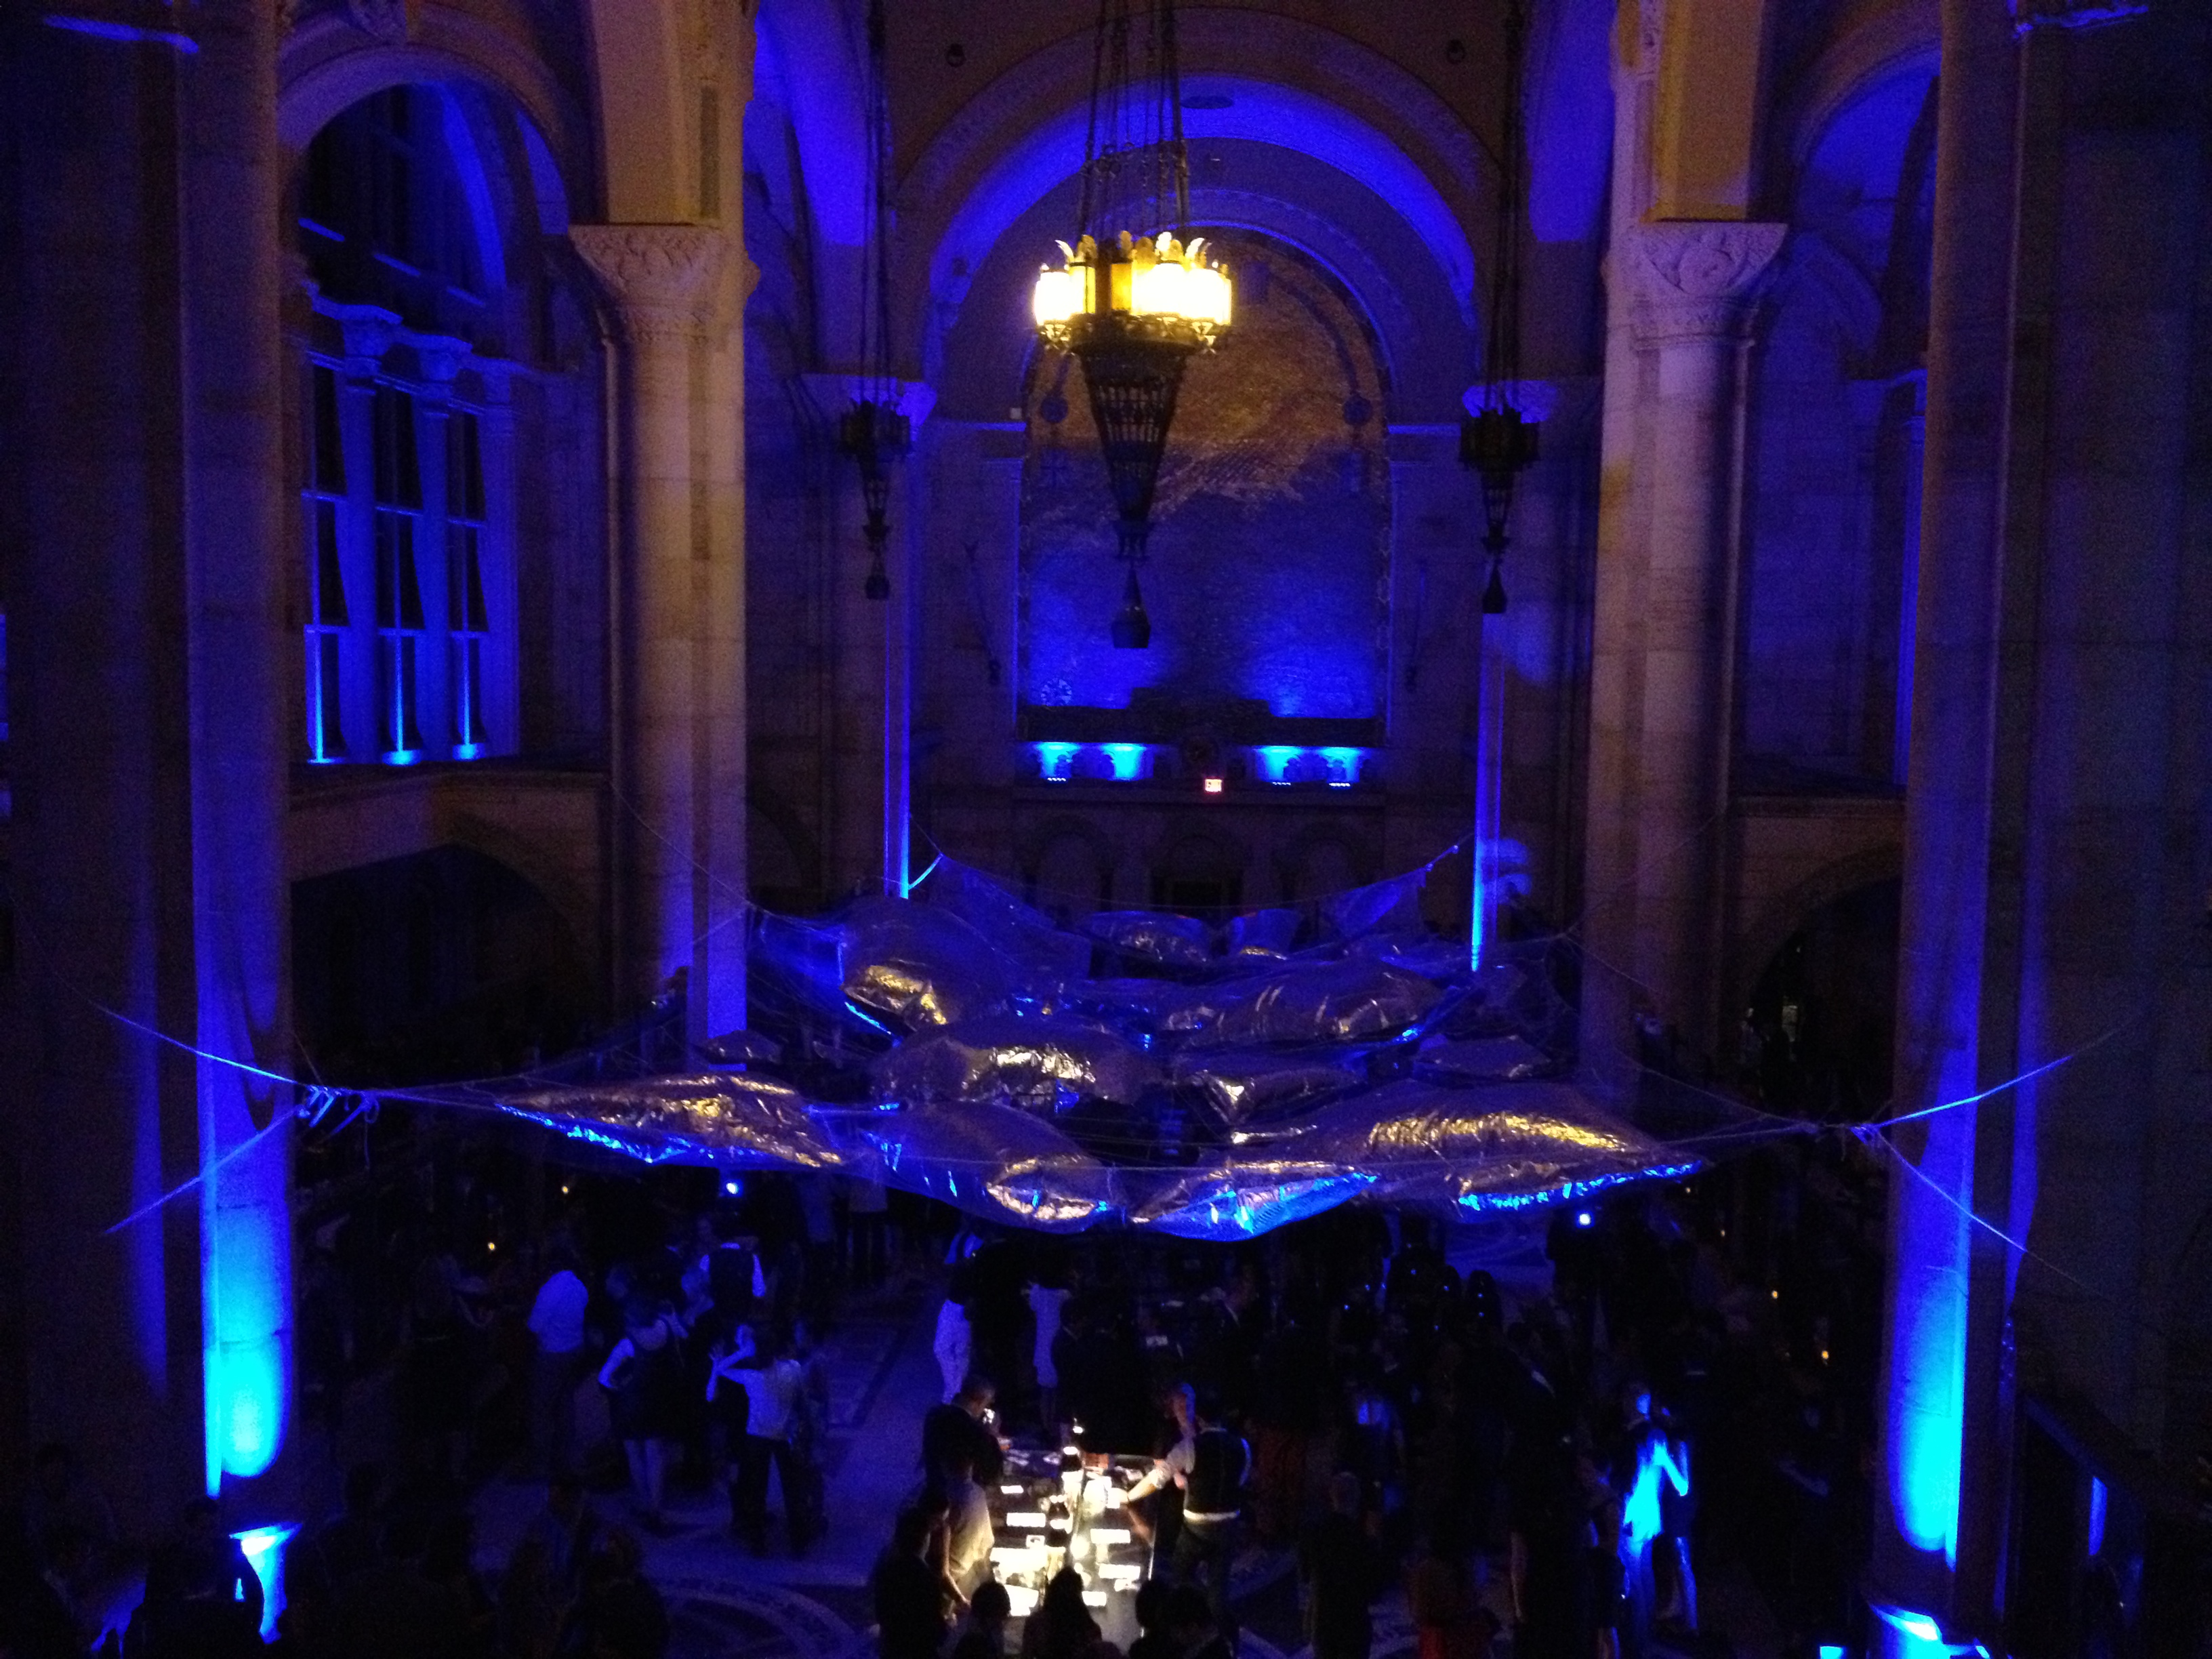 Beaux Arts Ball 2012: Tender, © K. Cilento